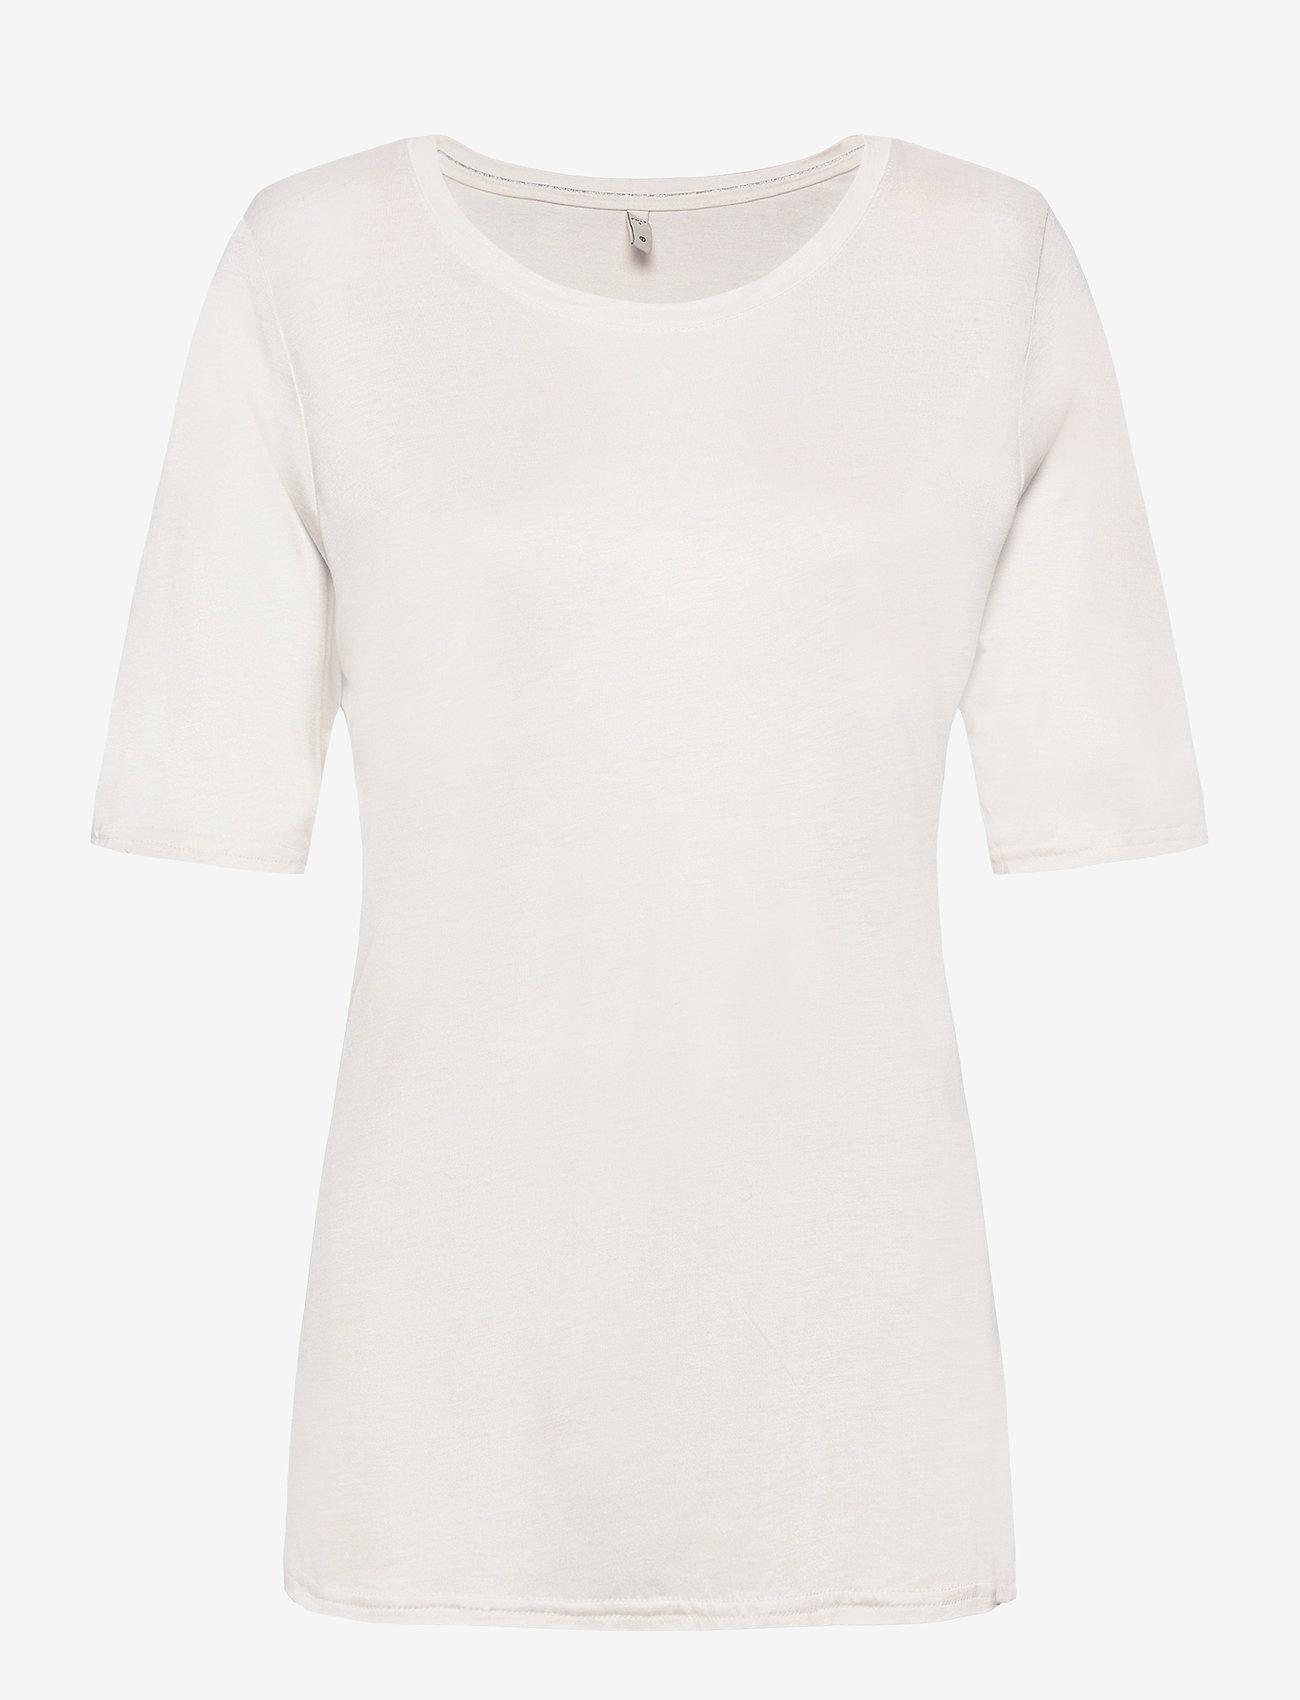 Pulz Jeans - PZCARLA t-shirt - t-shirts - white sand - 0